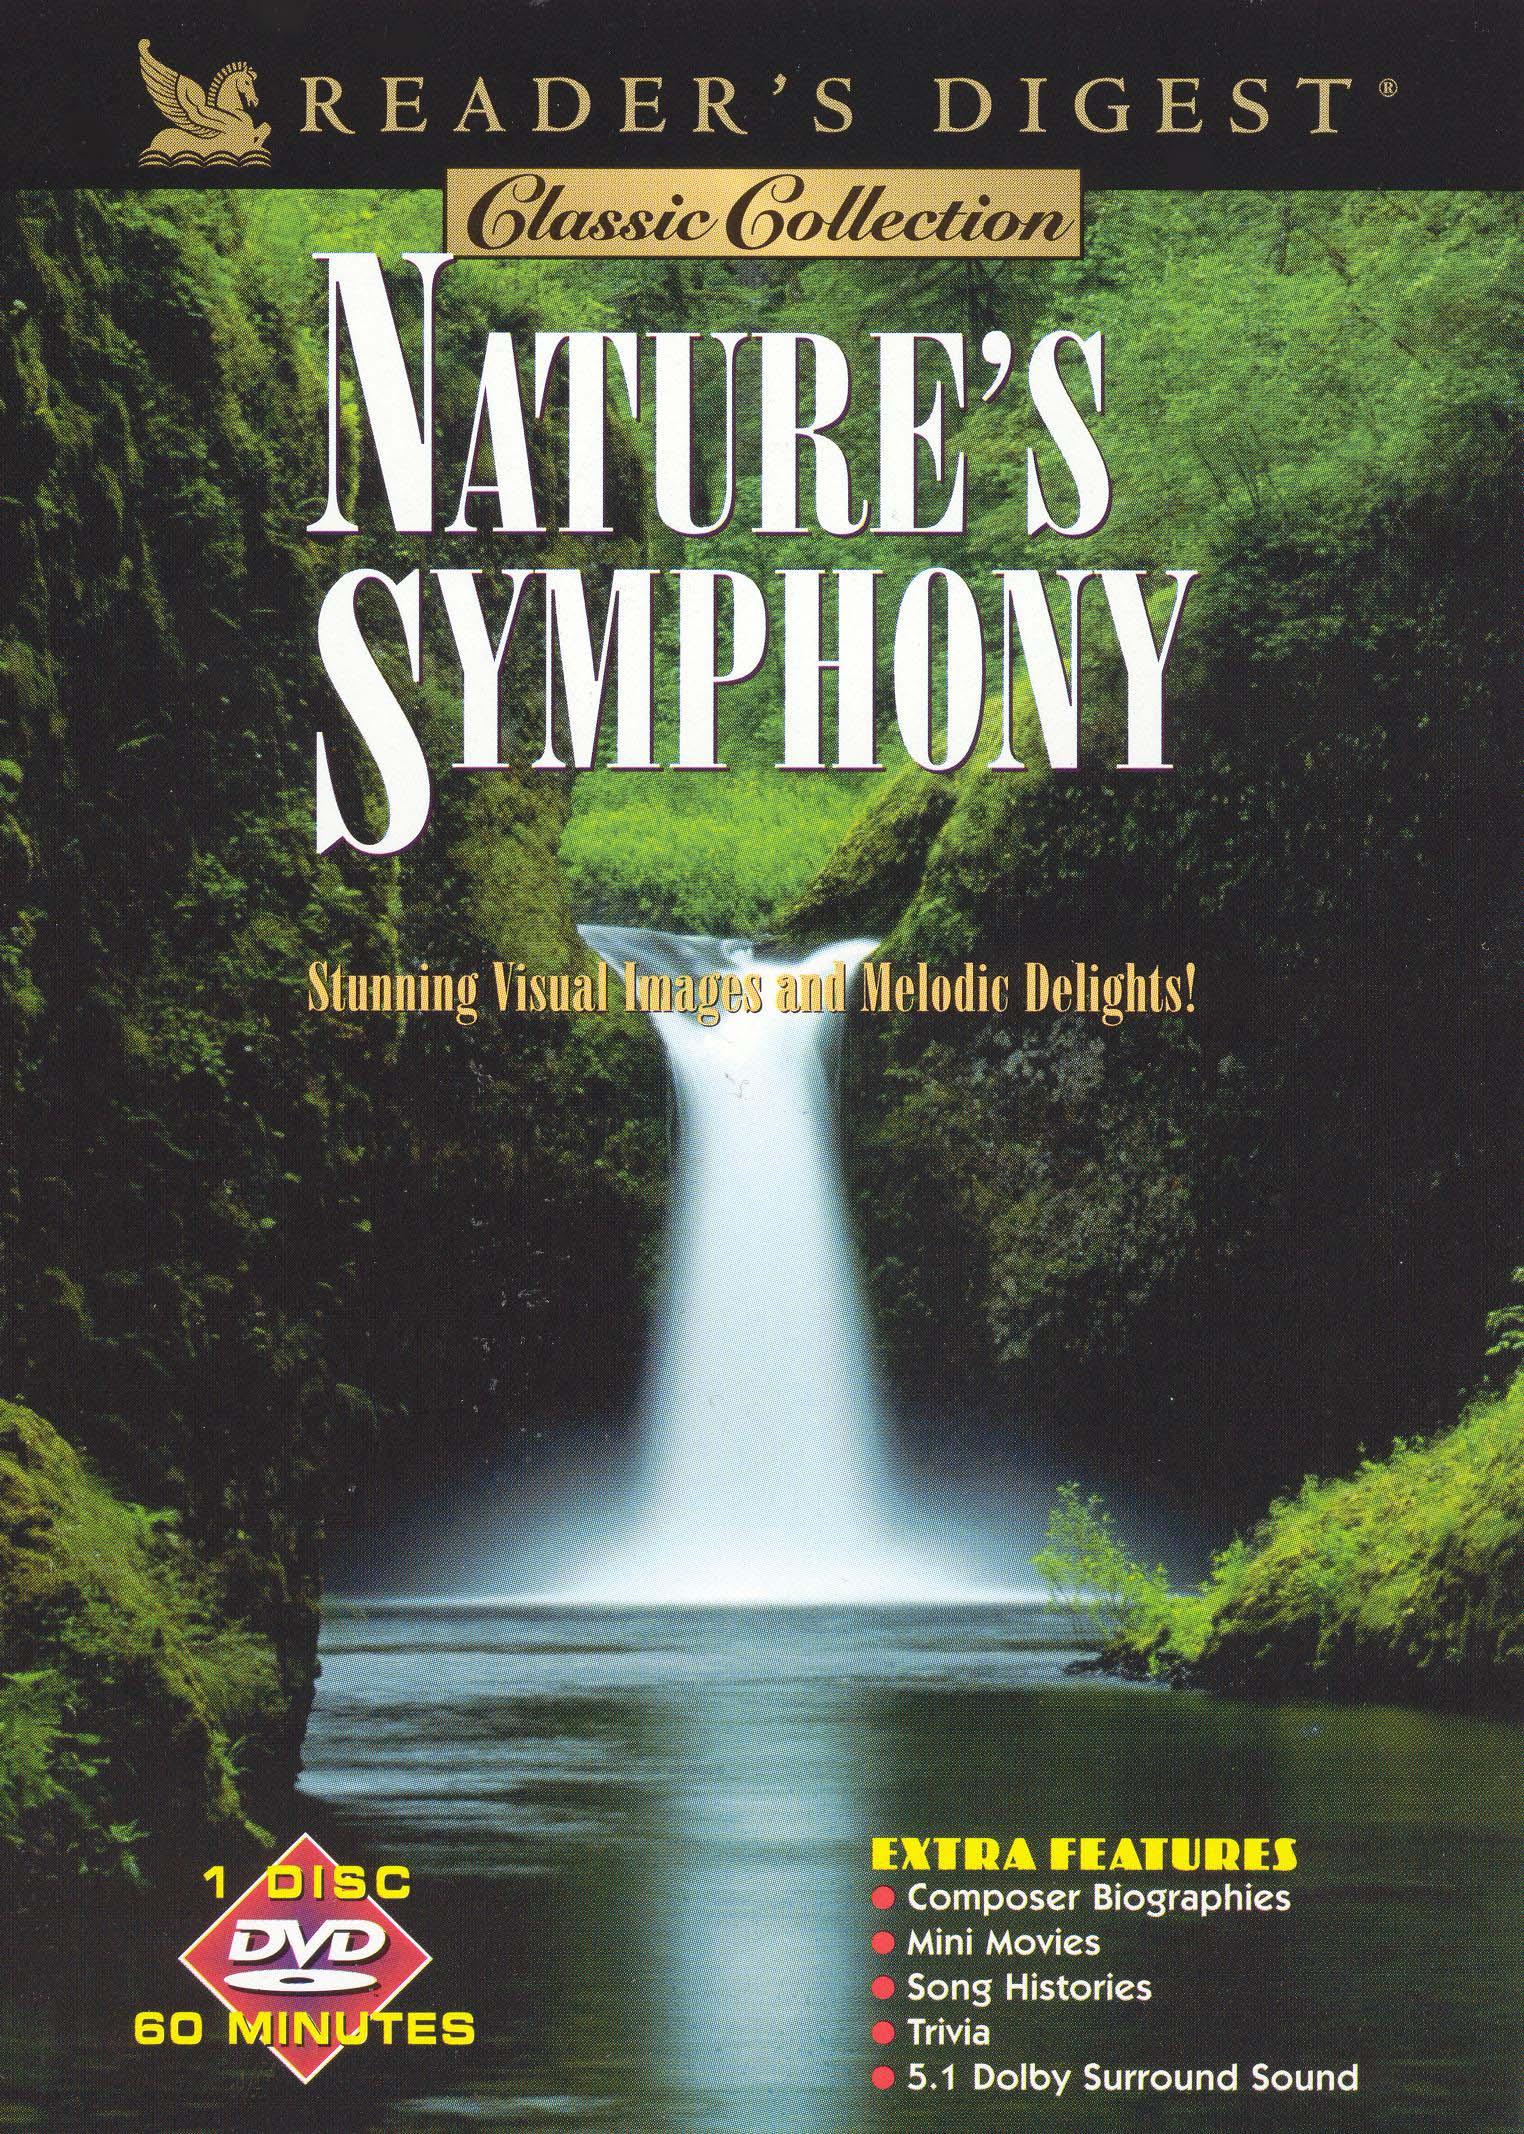 Reader's Digest: Nature's Symphony